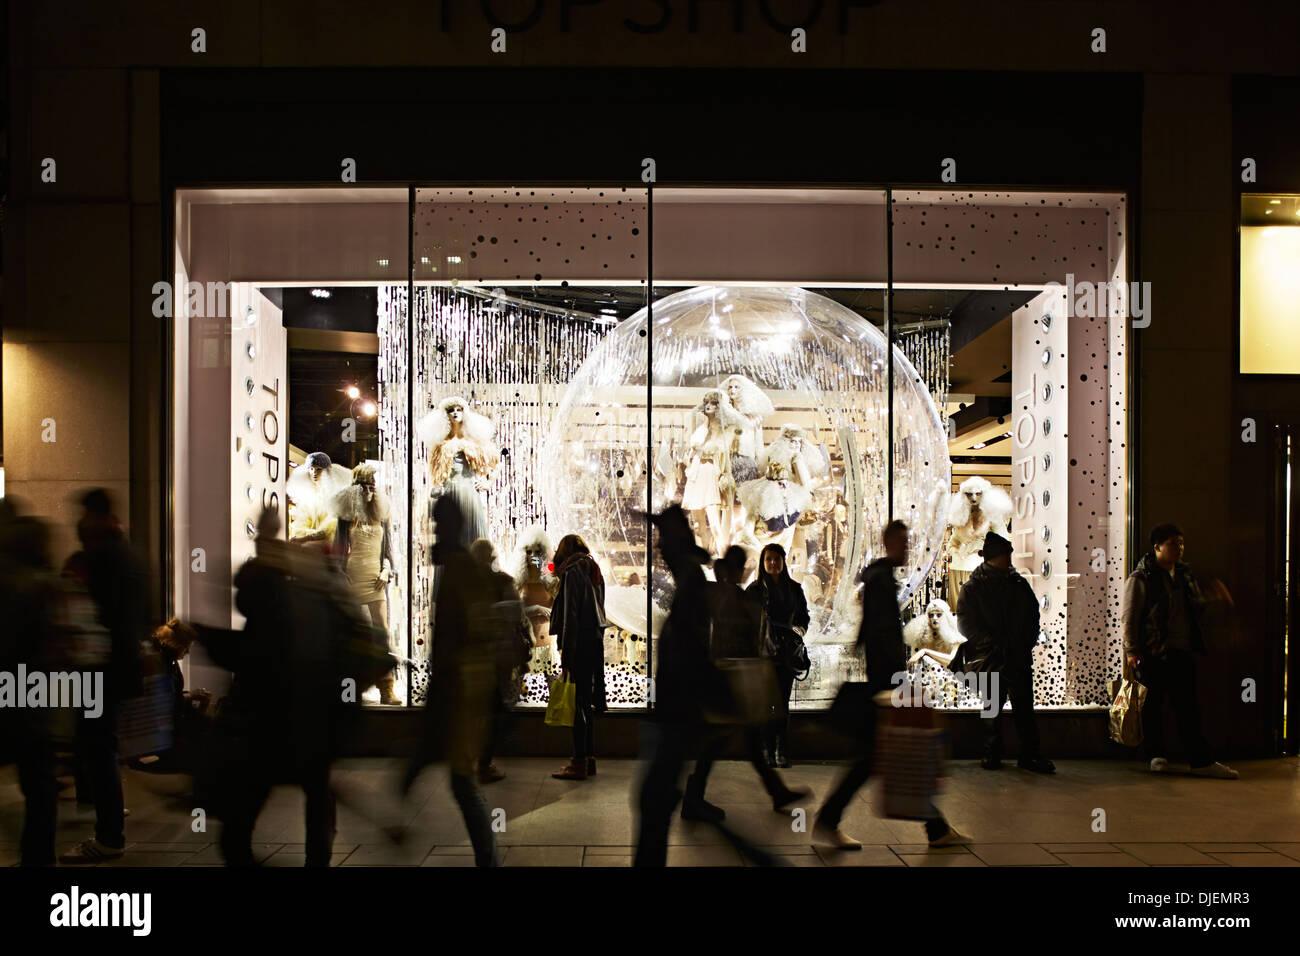 Oxford street Shopping scene, Topshop, London, England, UK,Christmas, Shopping, Winter. Stock Photo